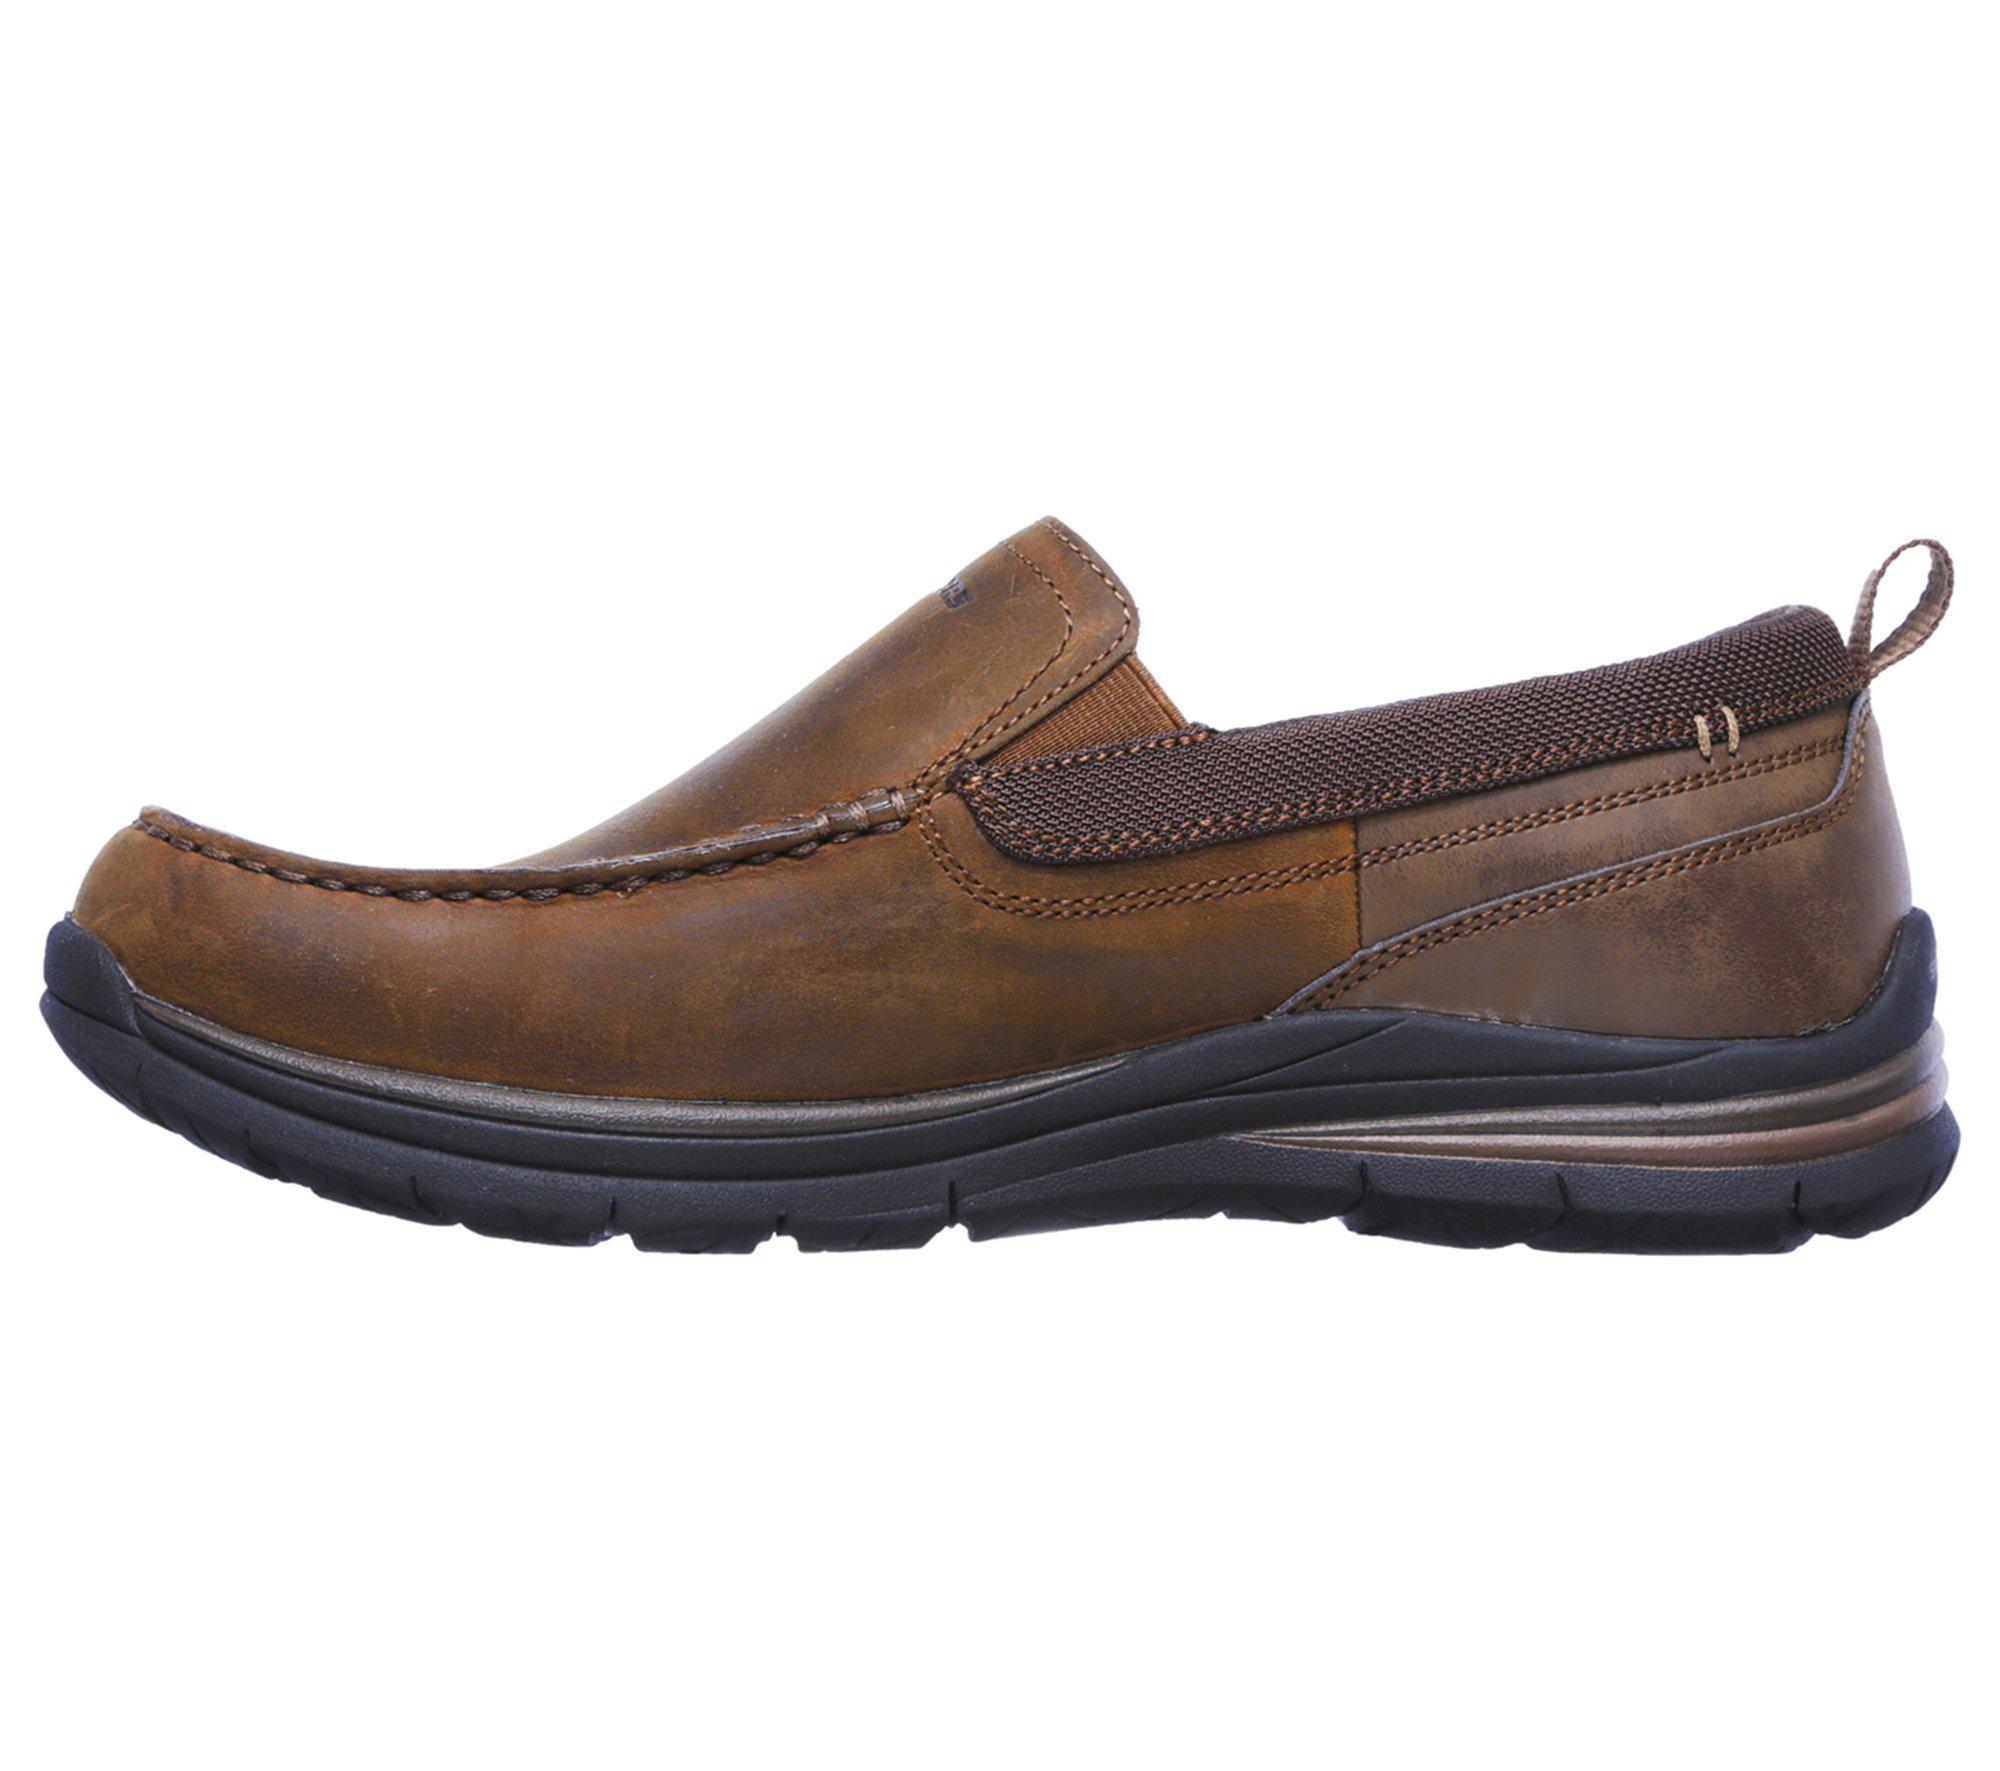 2558bec3b9a Lyst - Skechers Superior 2.0 - Jeveno in Brown for Men